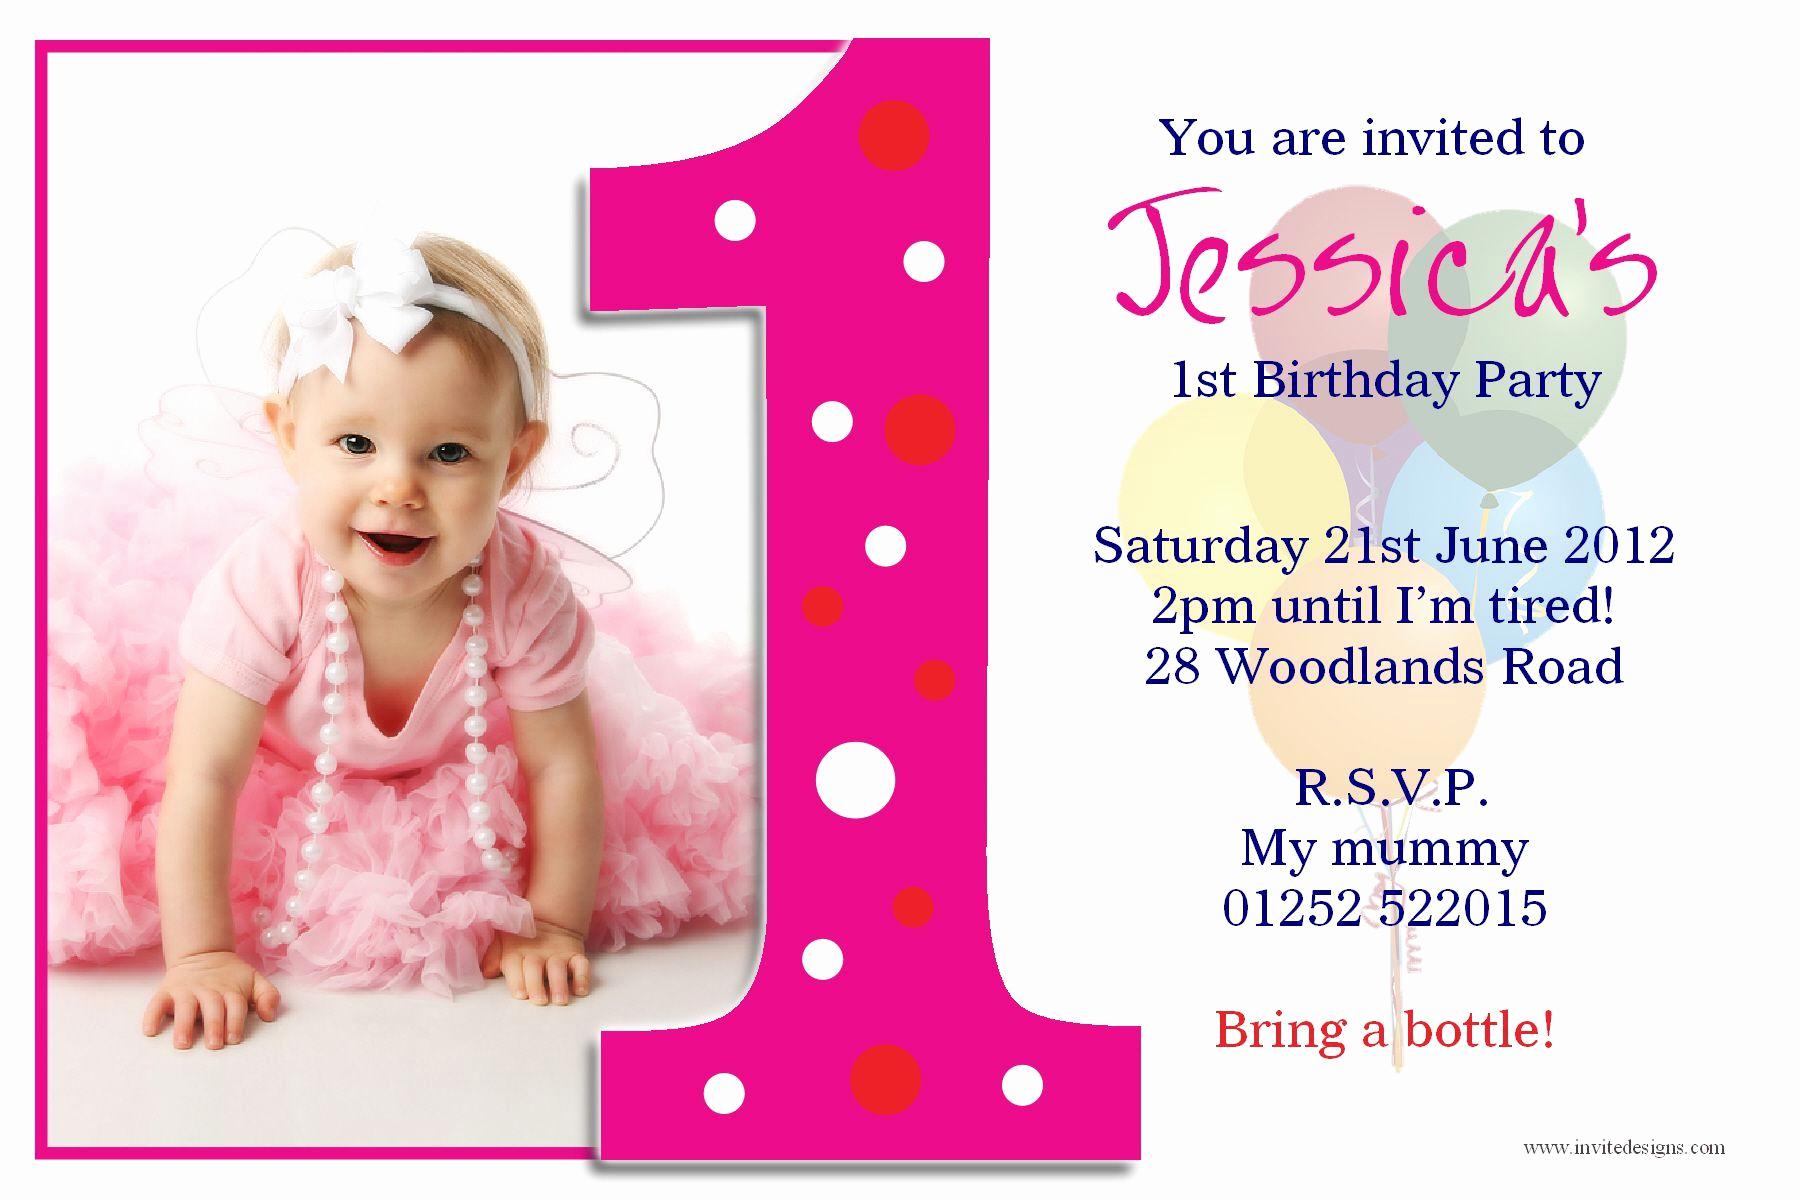 Birthday Invitation Card Ideas Beautiful Birthday Party First Birthday Invitations Card